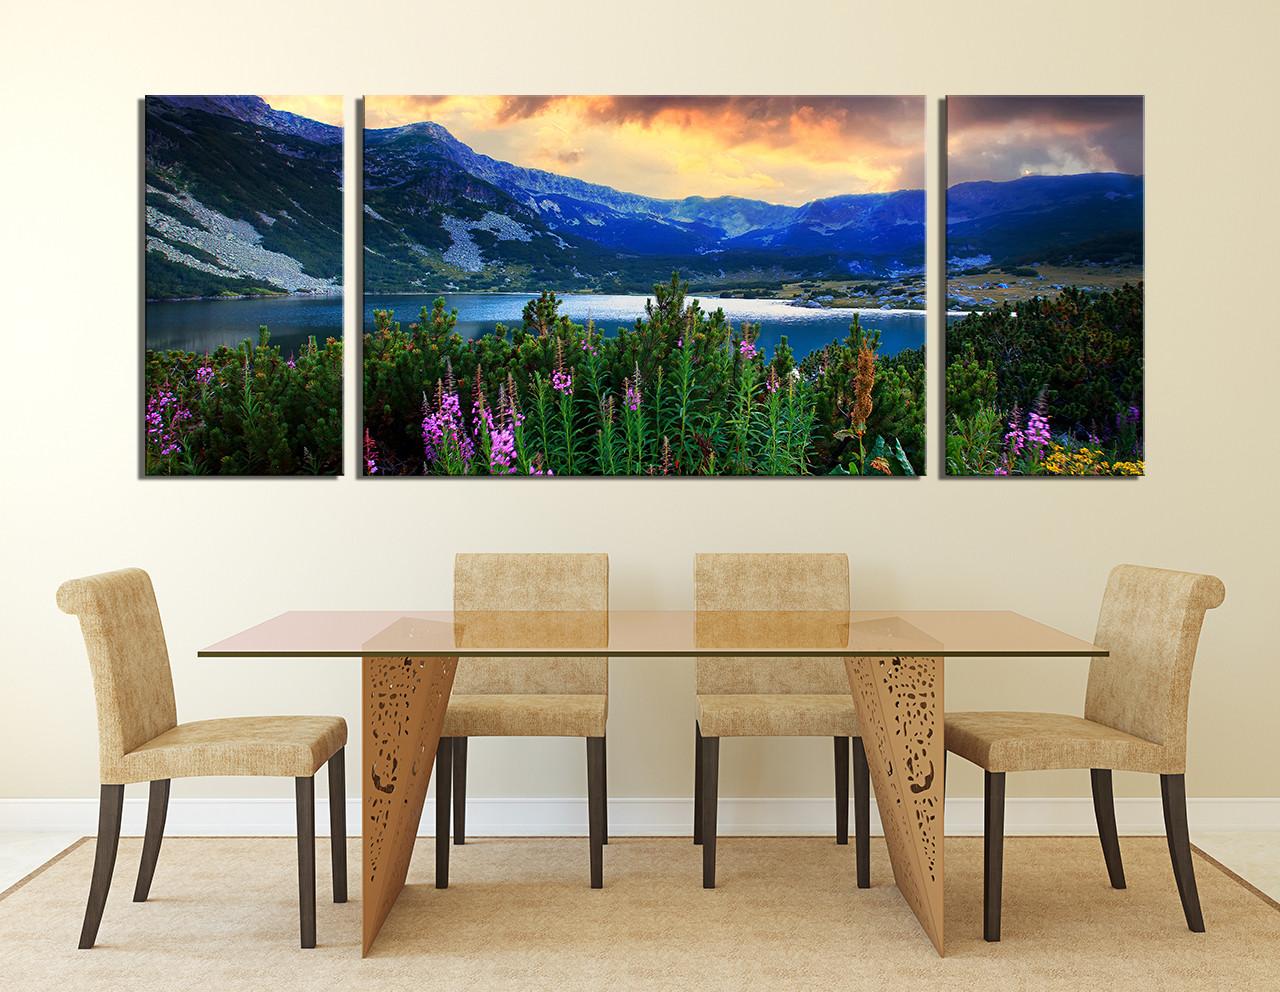 3 Piece Canvas Wall Art, Dining Room Wall Decor, Landscape Multi Panel  Canvas,